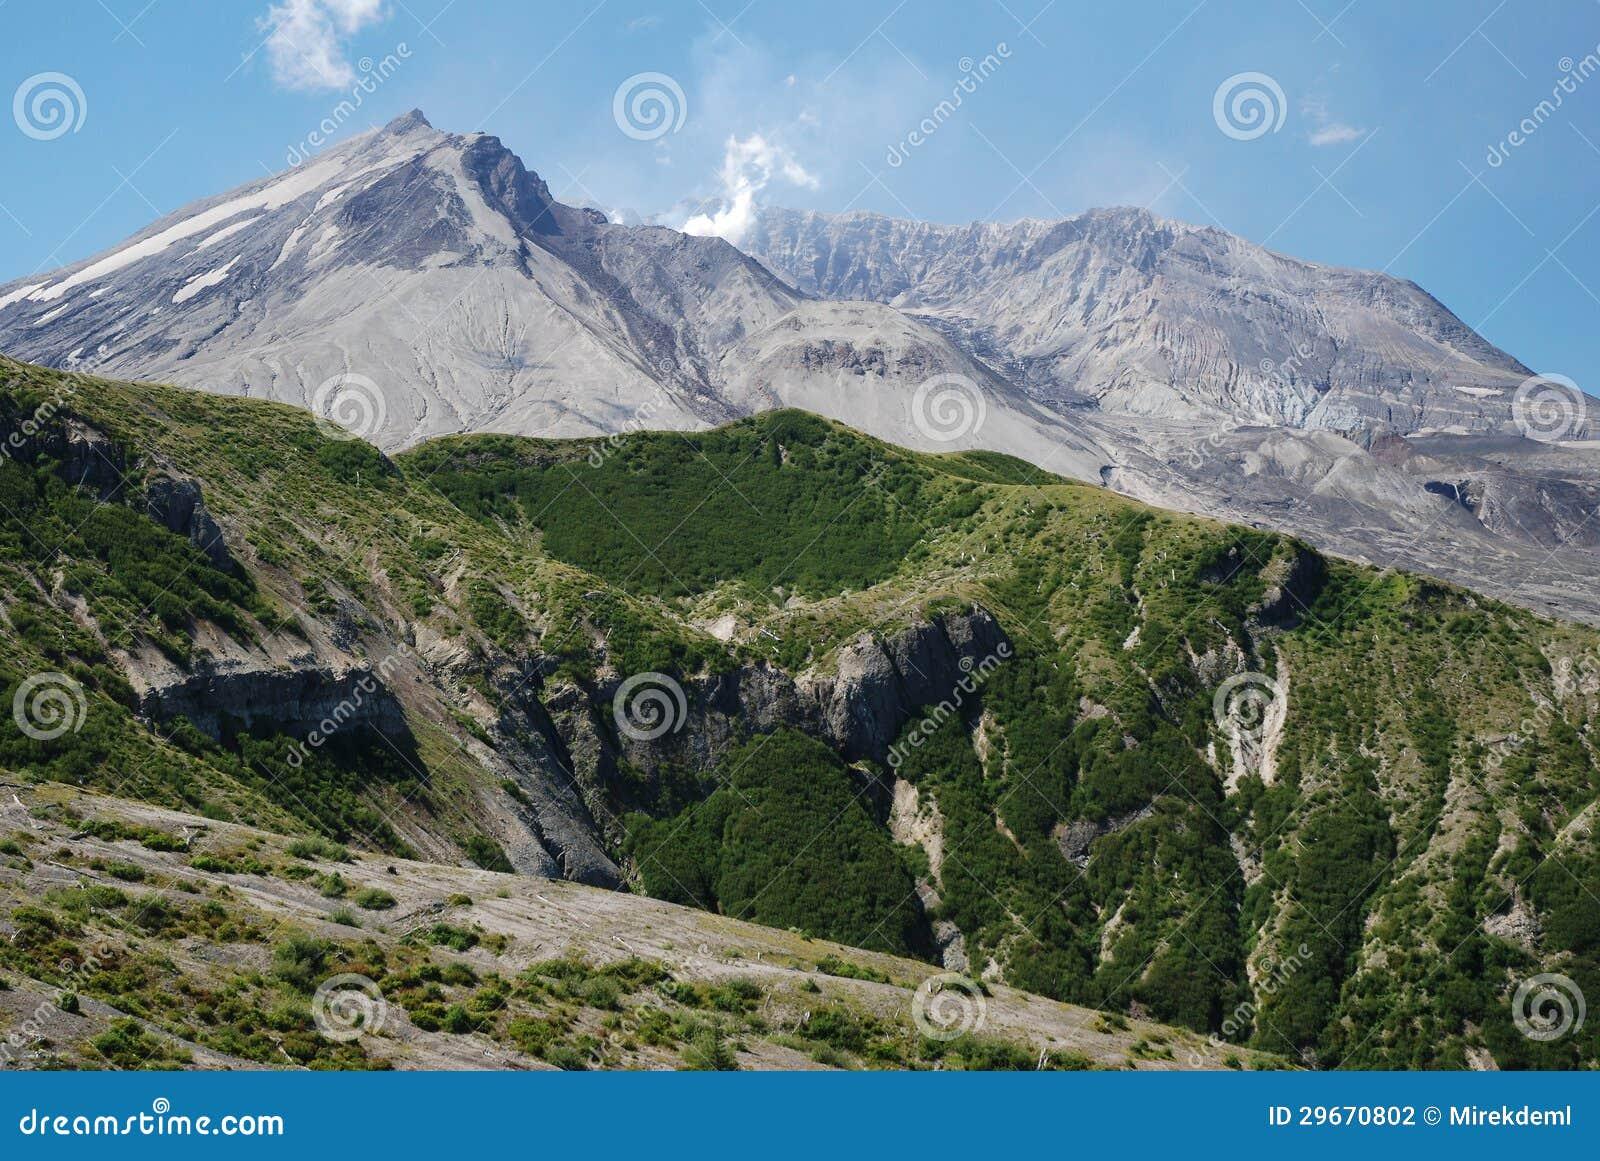 le mont helens washington etats unis photographie stock image 29670802